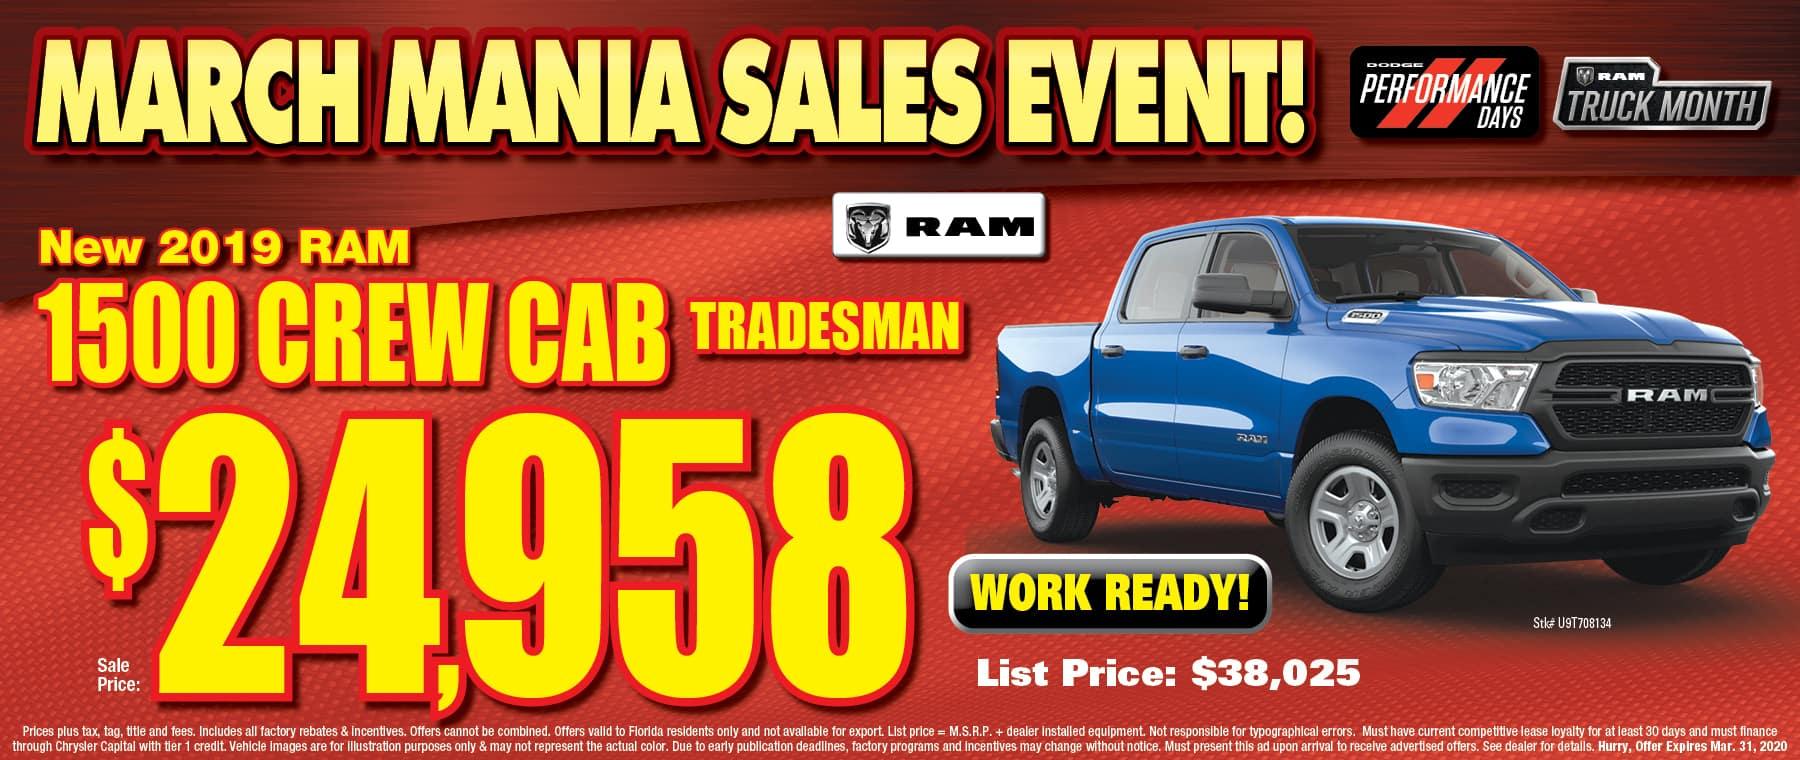 Ram Crew Cab Tradesman!